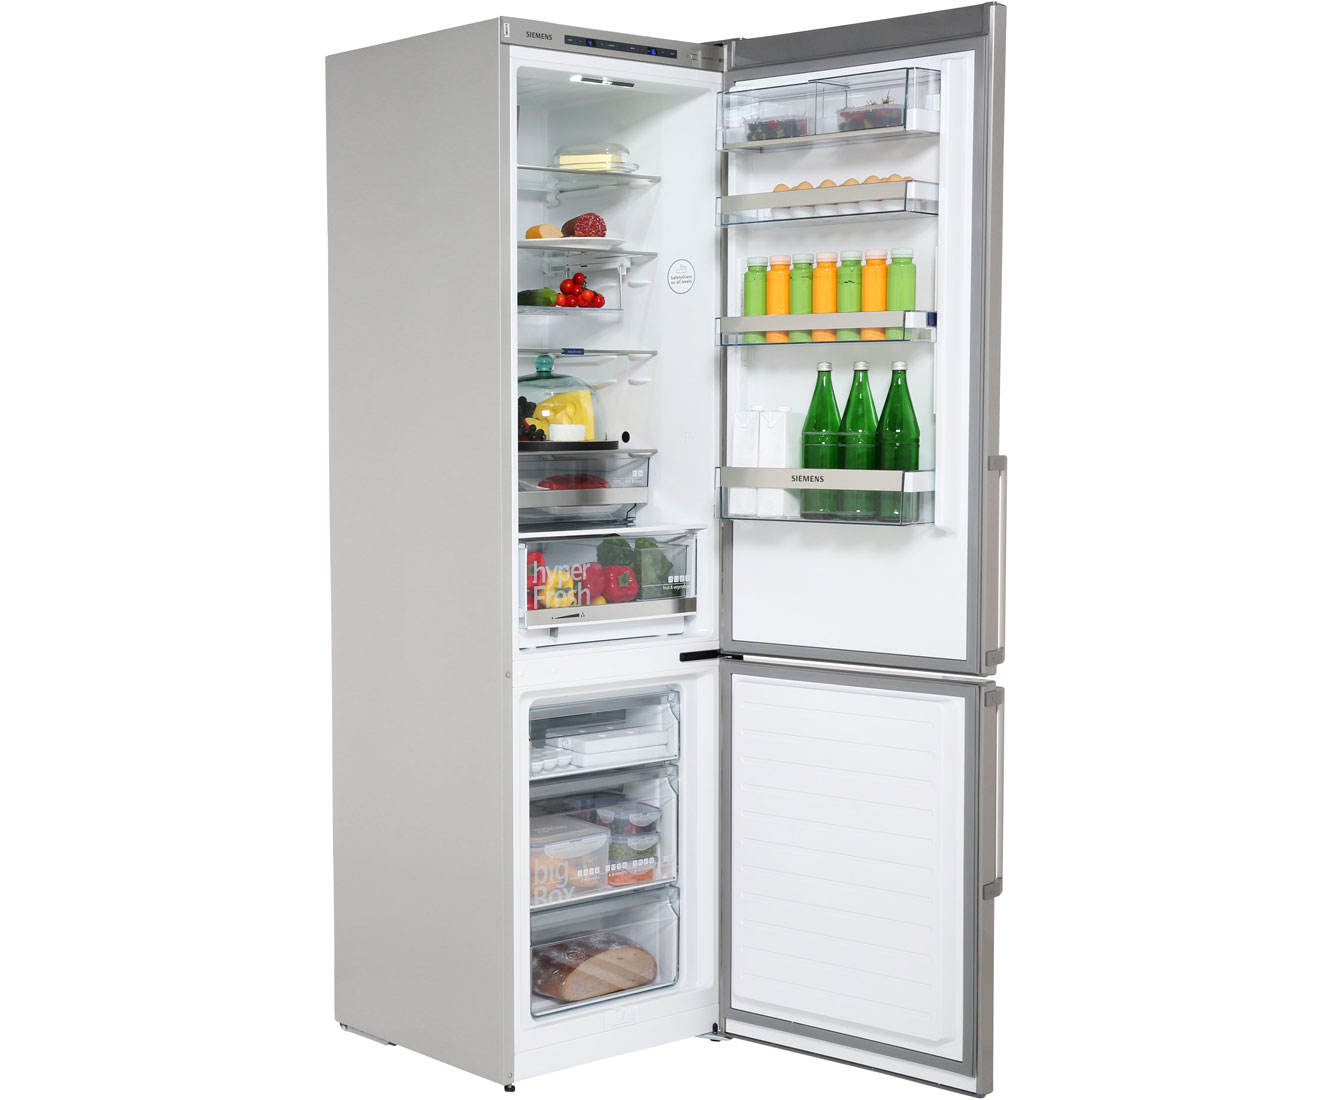 Siemens Kühlschrank Kg39eai40 : Siemens kühl gefrierkombination edelstahl no frost siemens kg